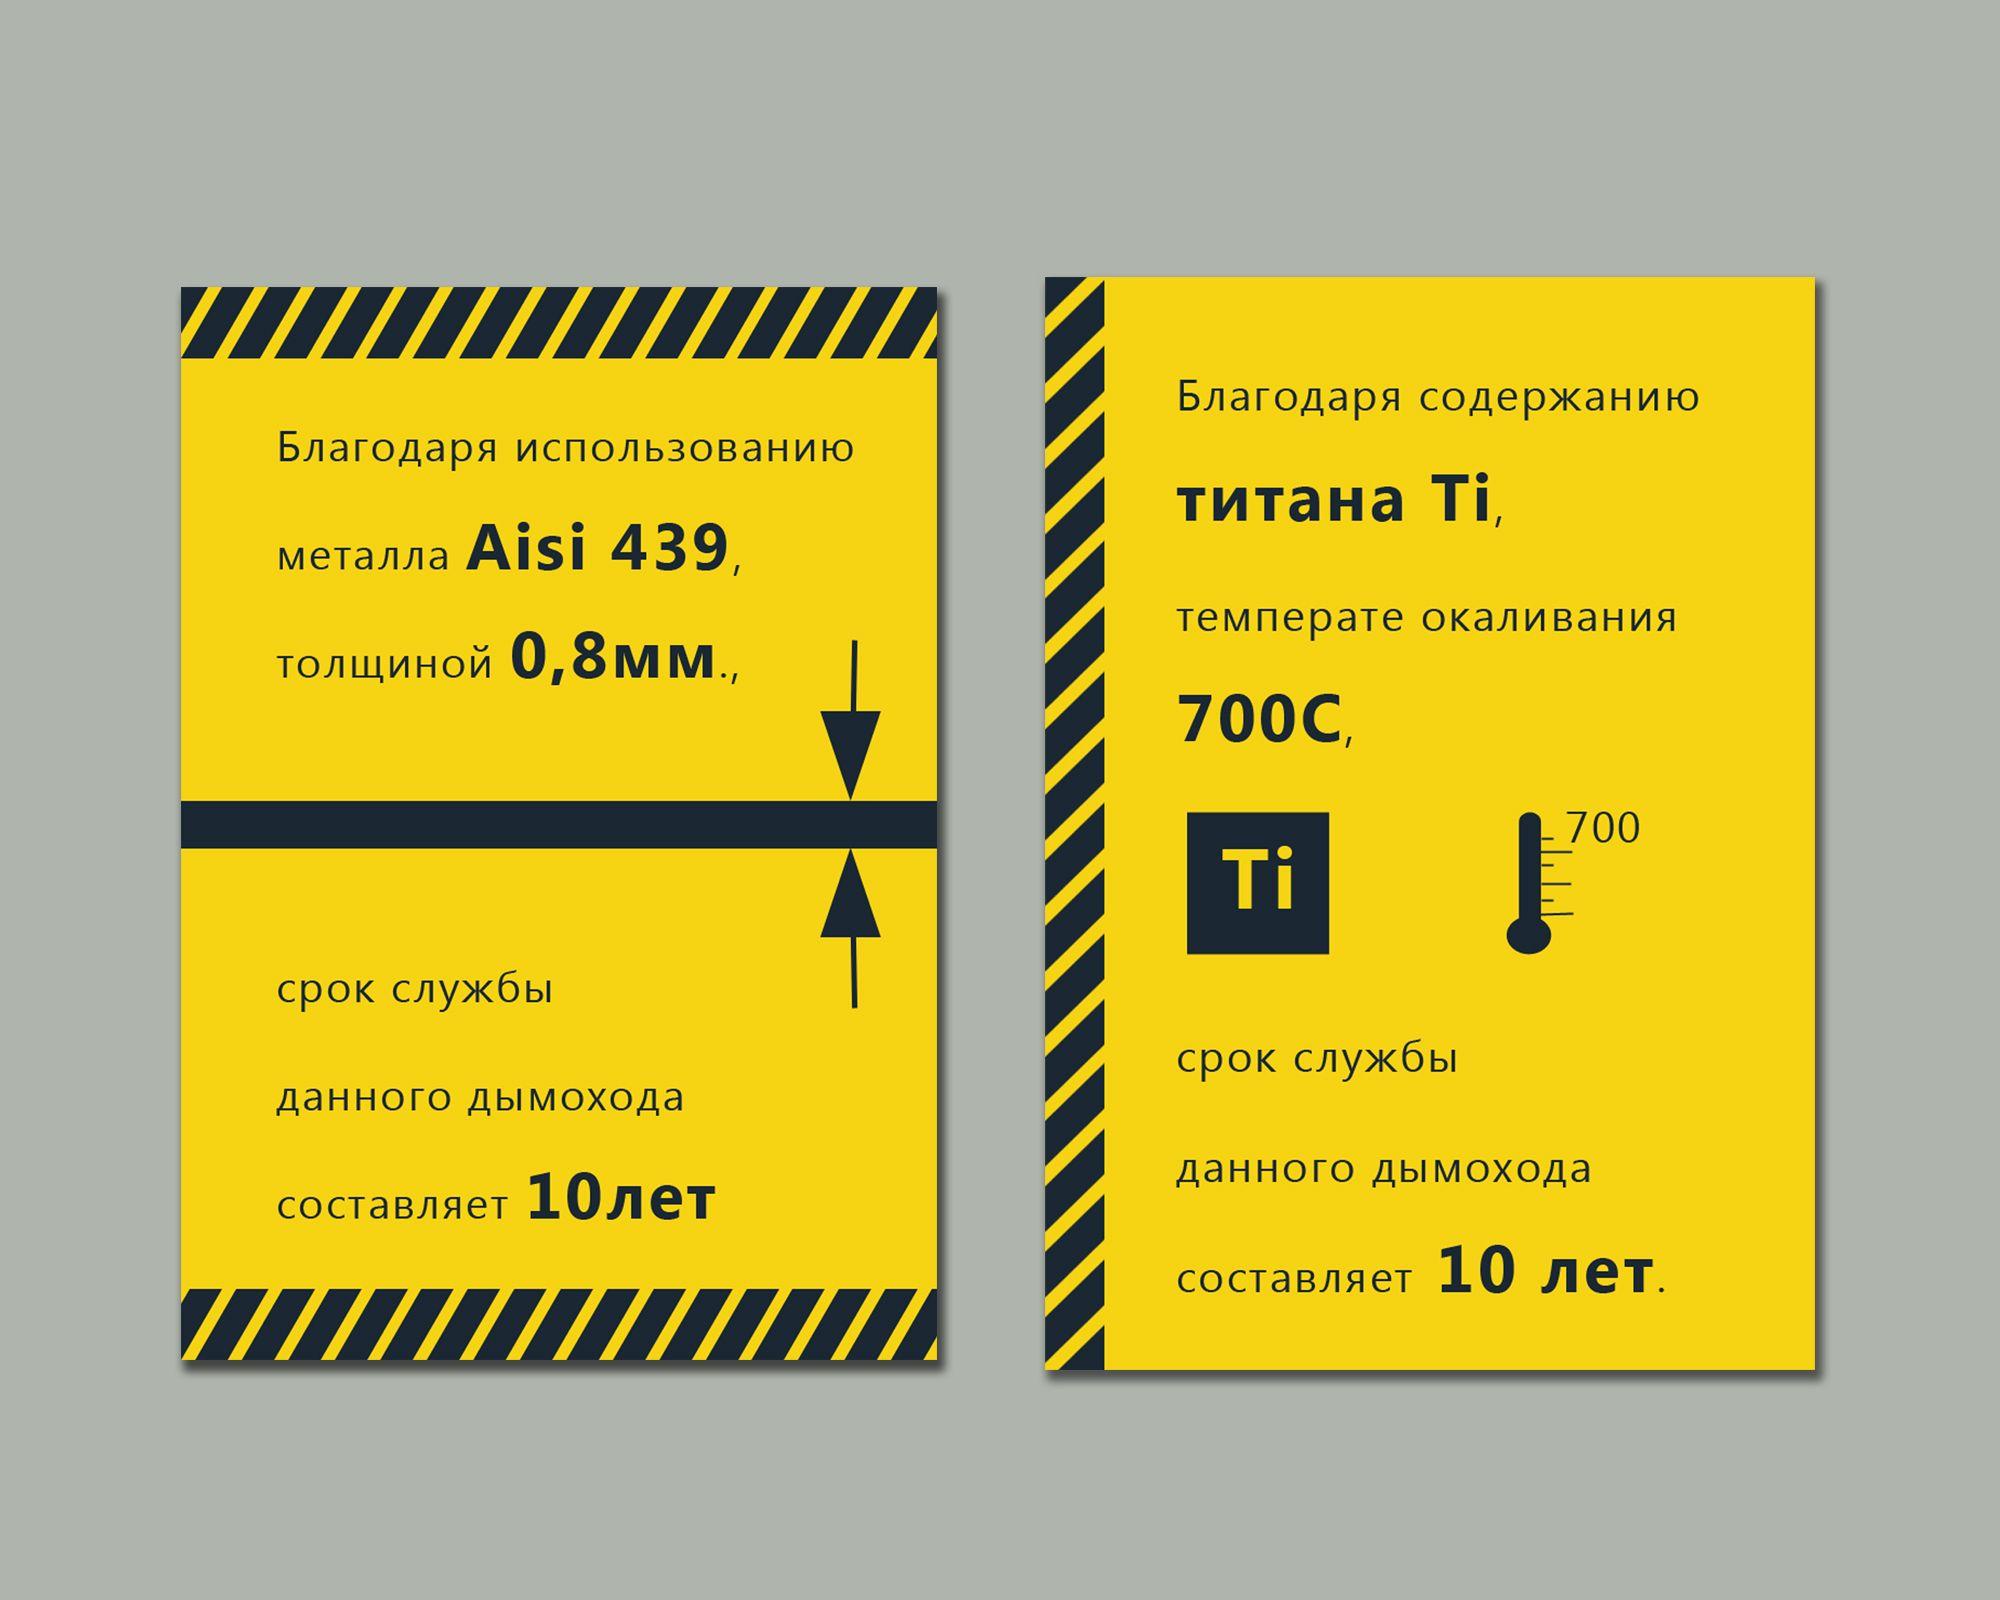 Наклейка на дымоход - дизайнер deco